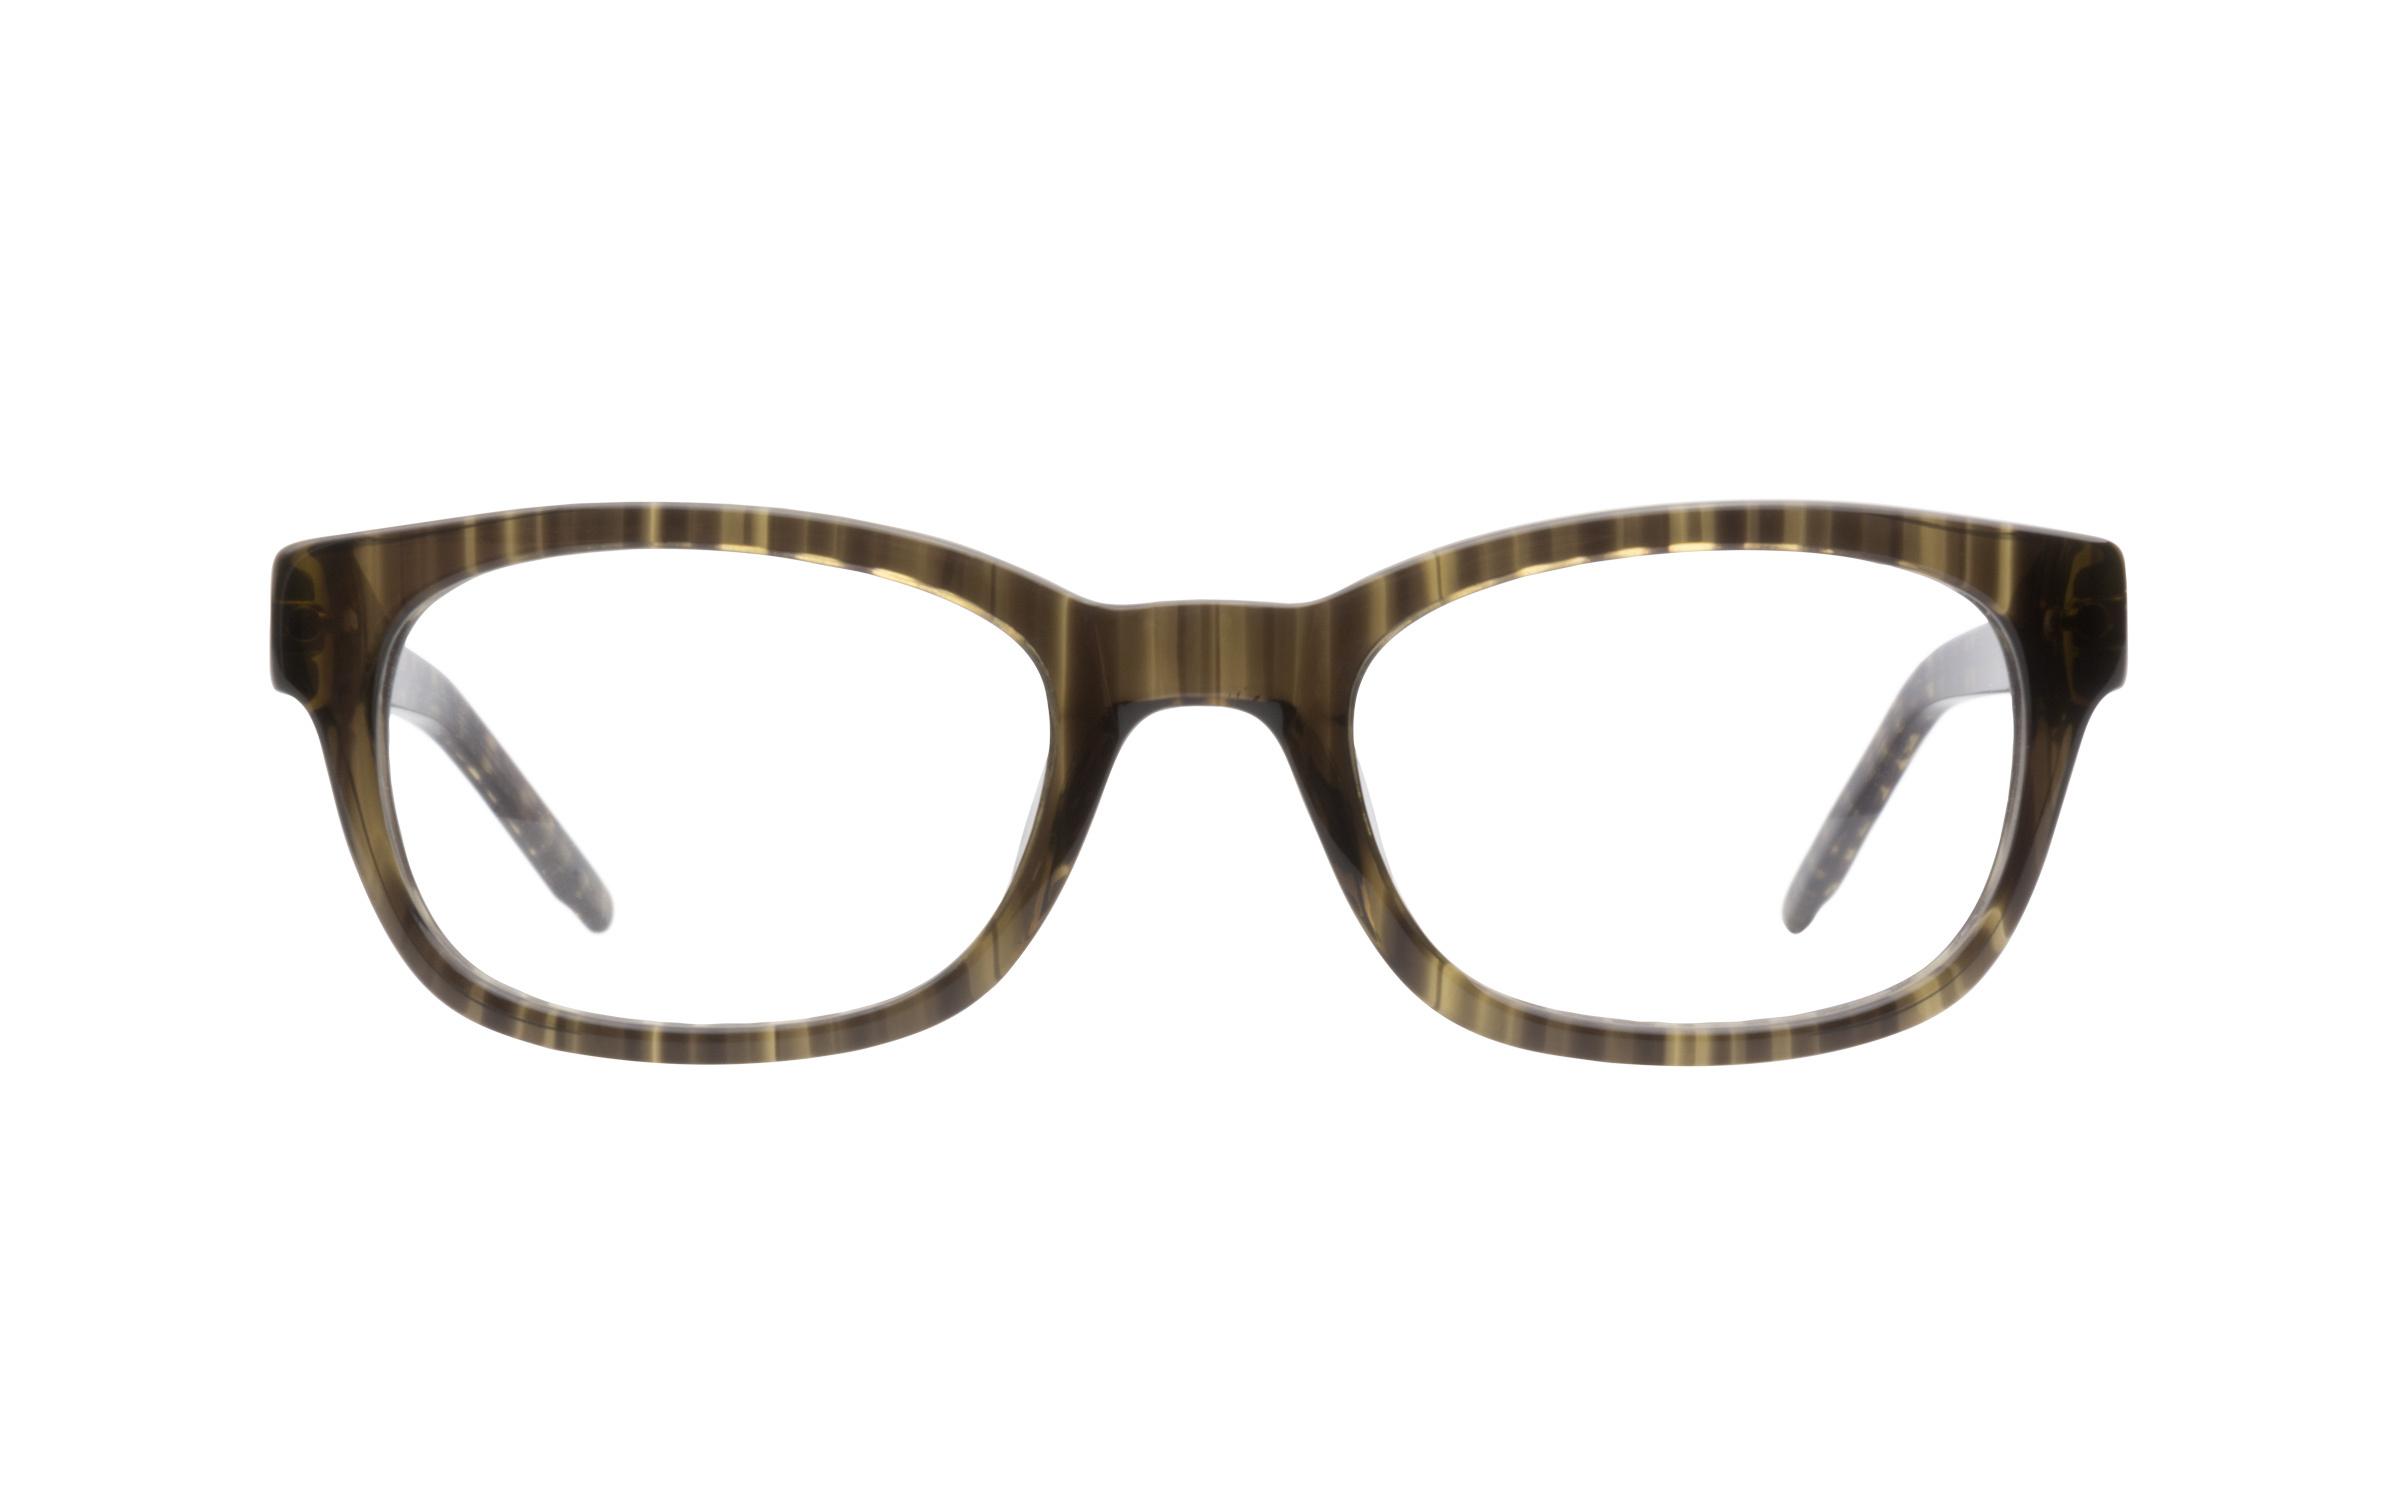 Modo 5010 Eyeglasses and Frame in Lines Green | Acetate - Online Coastal